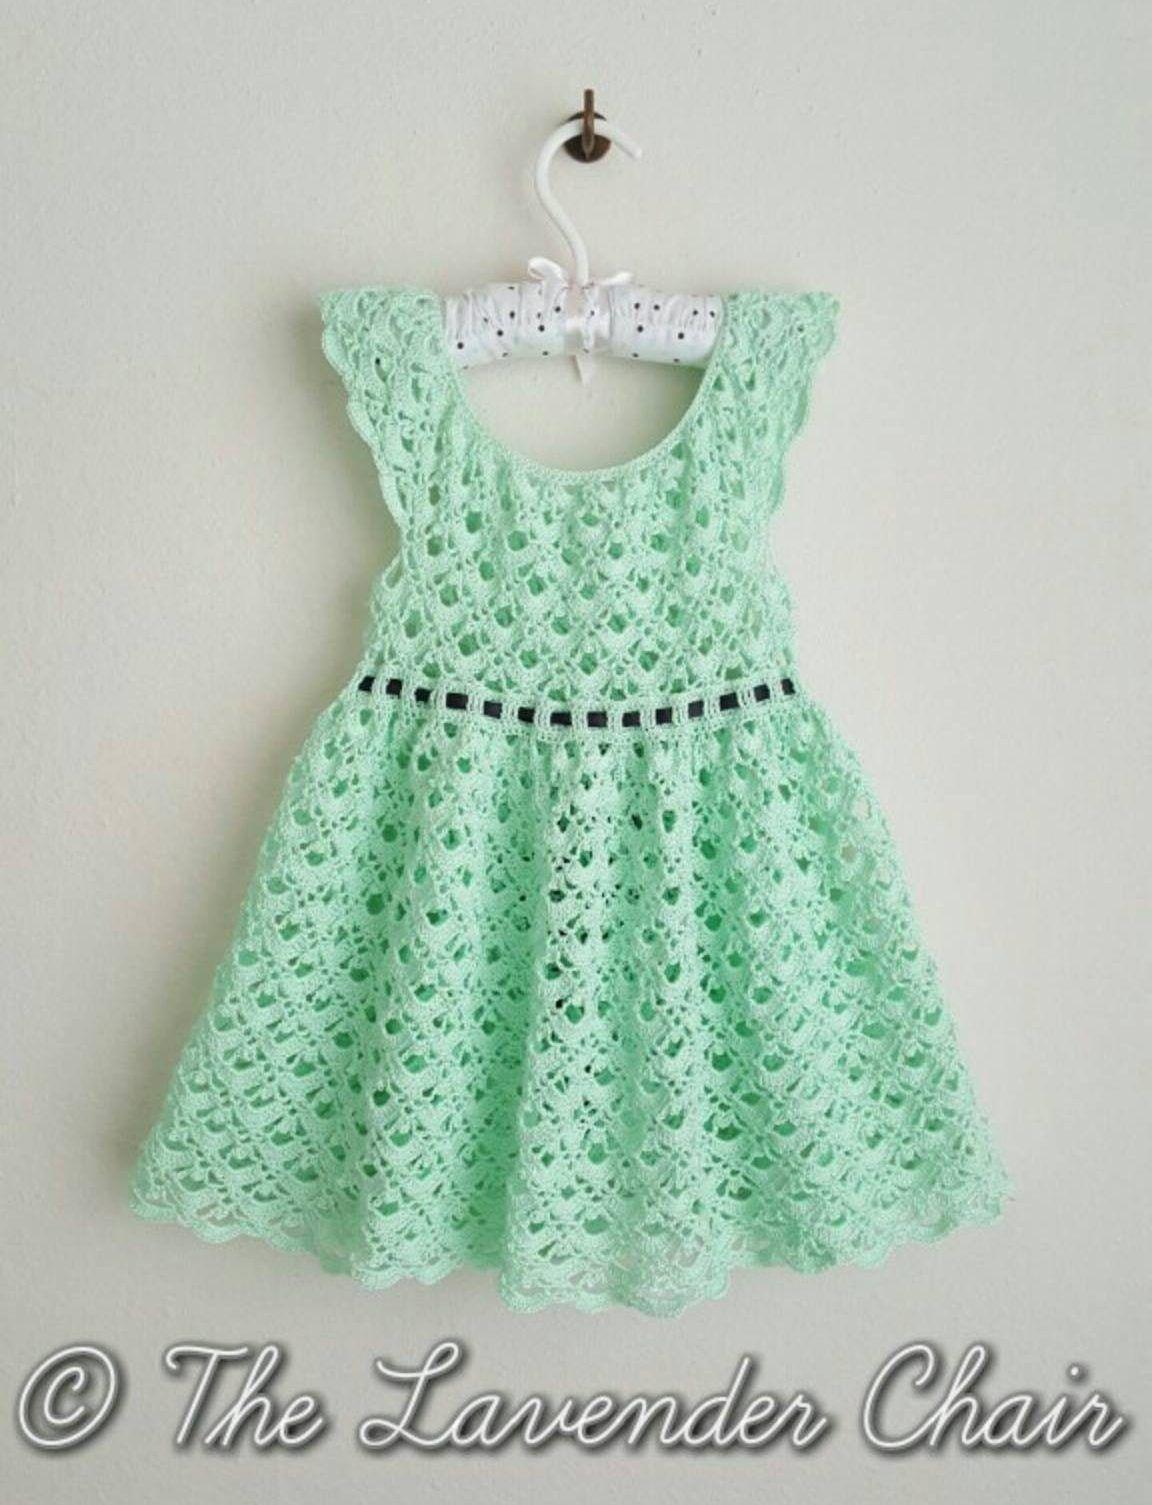 Gemstone Lace Toddler Dress Crochet Pattern The Lavender Chair Crochet Toddler Dress Crochet Toddler Crochet Baby Dress